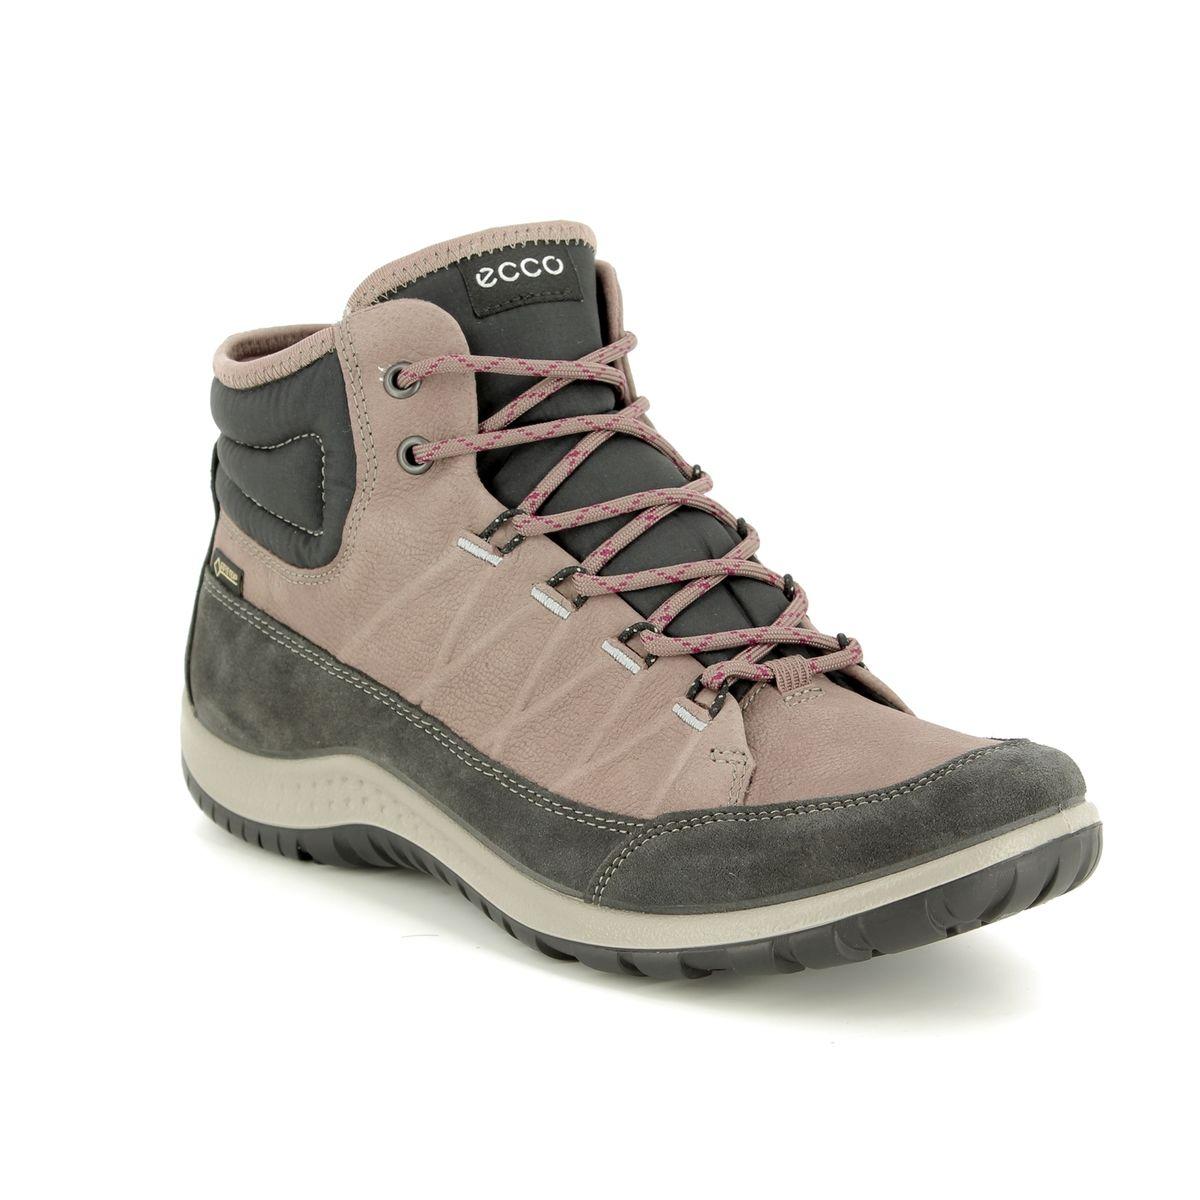 37c7ad71 ECCO Walking Boots - Taupe multi - 838513/51194 ASPINA HI GORE-TEX